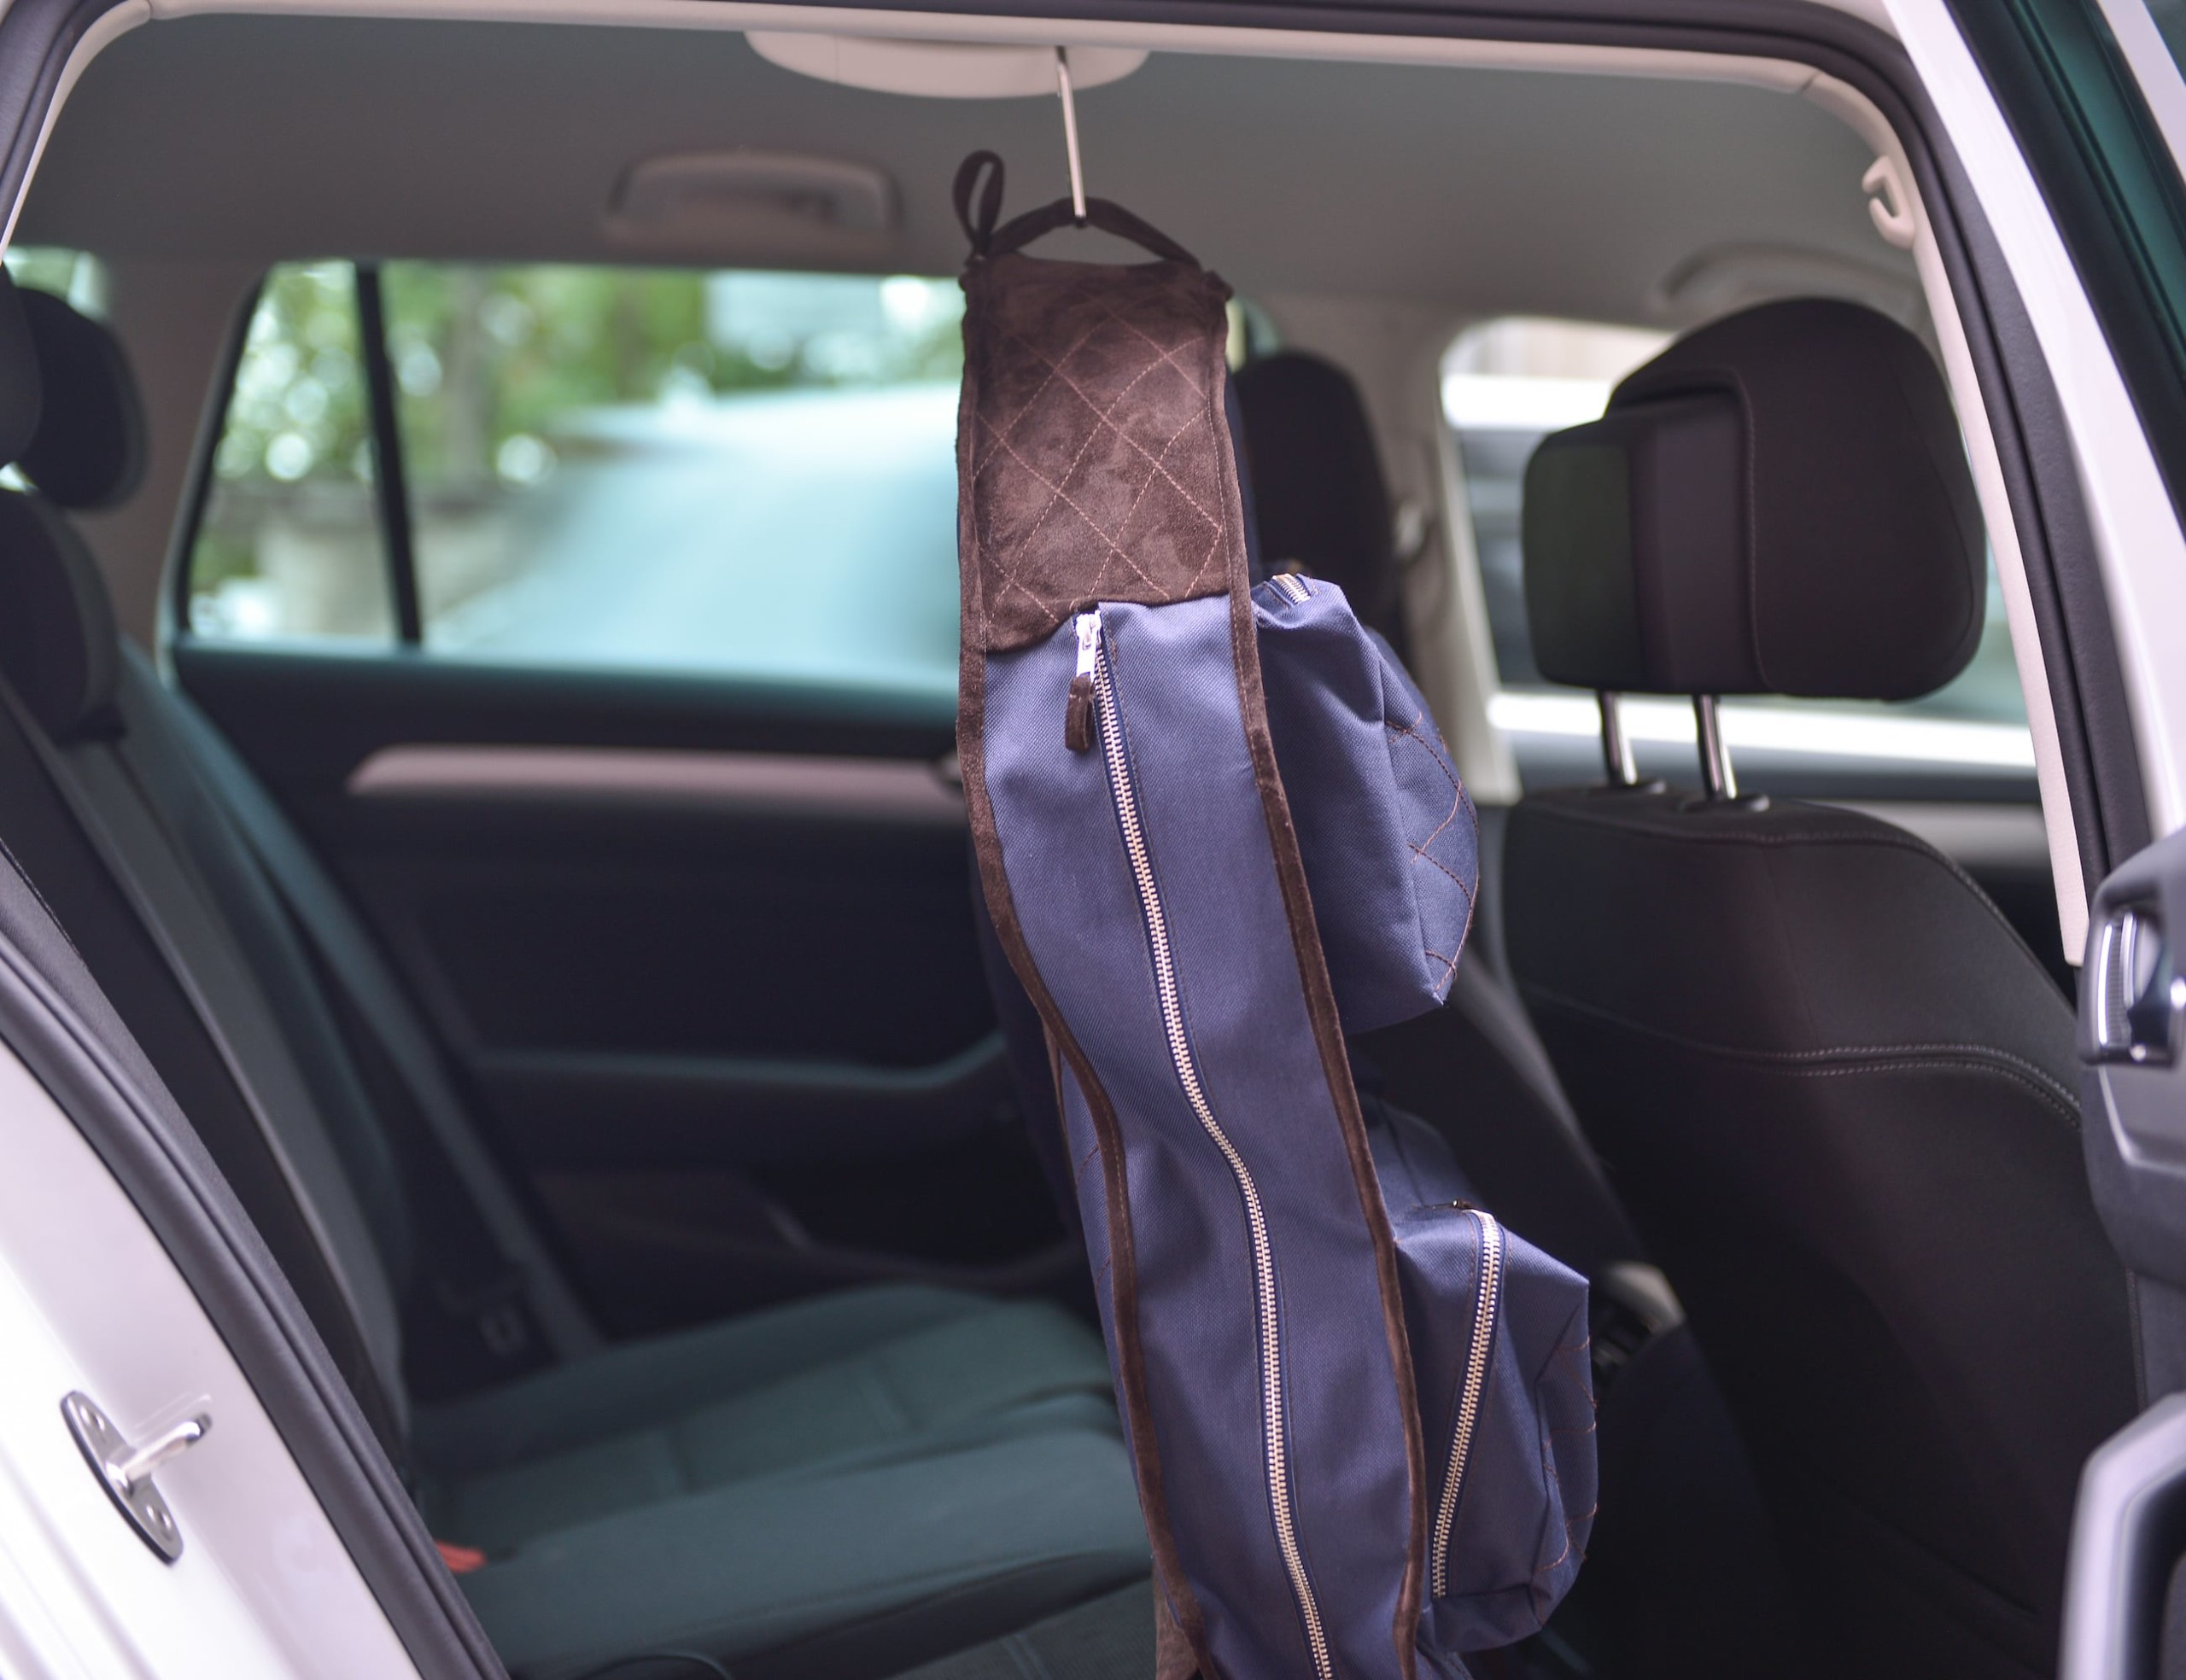 MADO Hanger Travel Bag will make your road trips easier